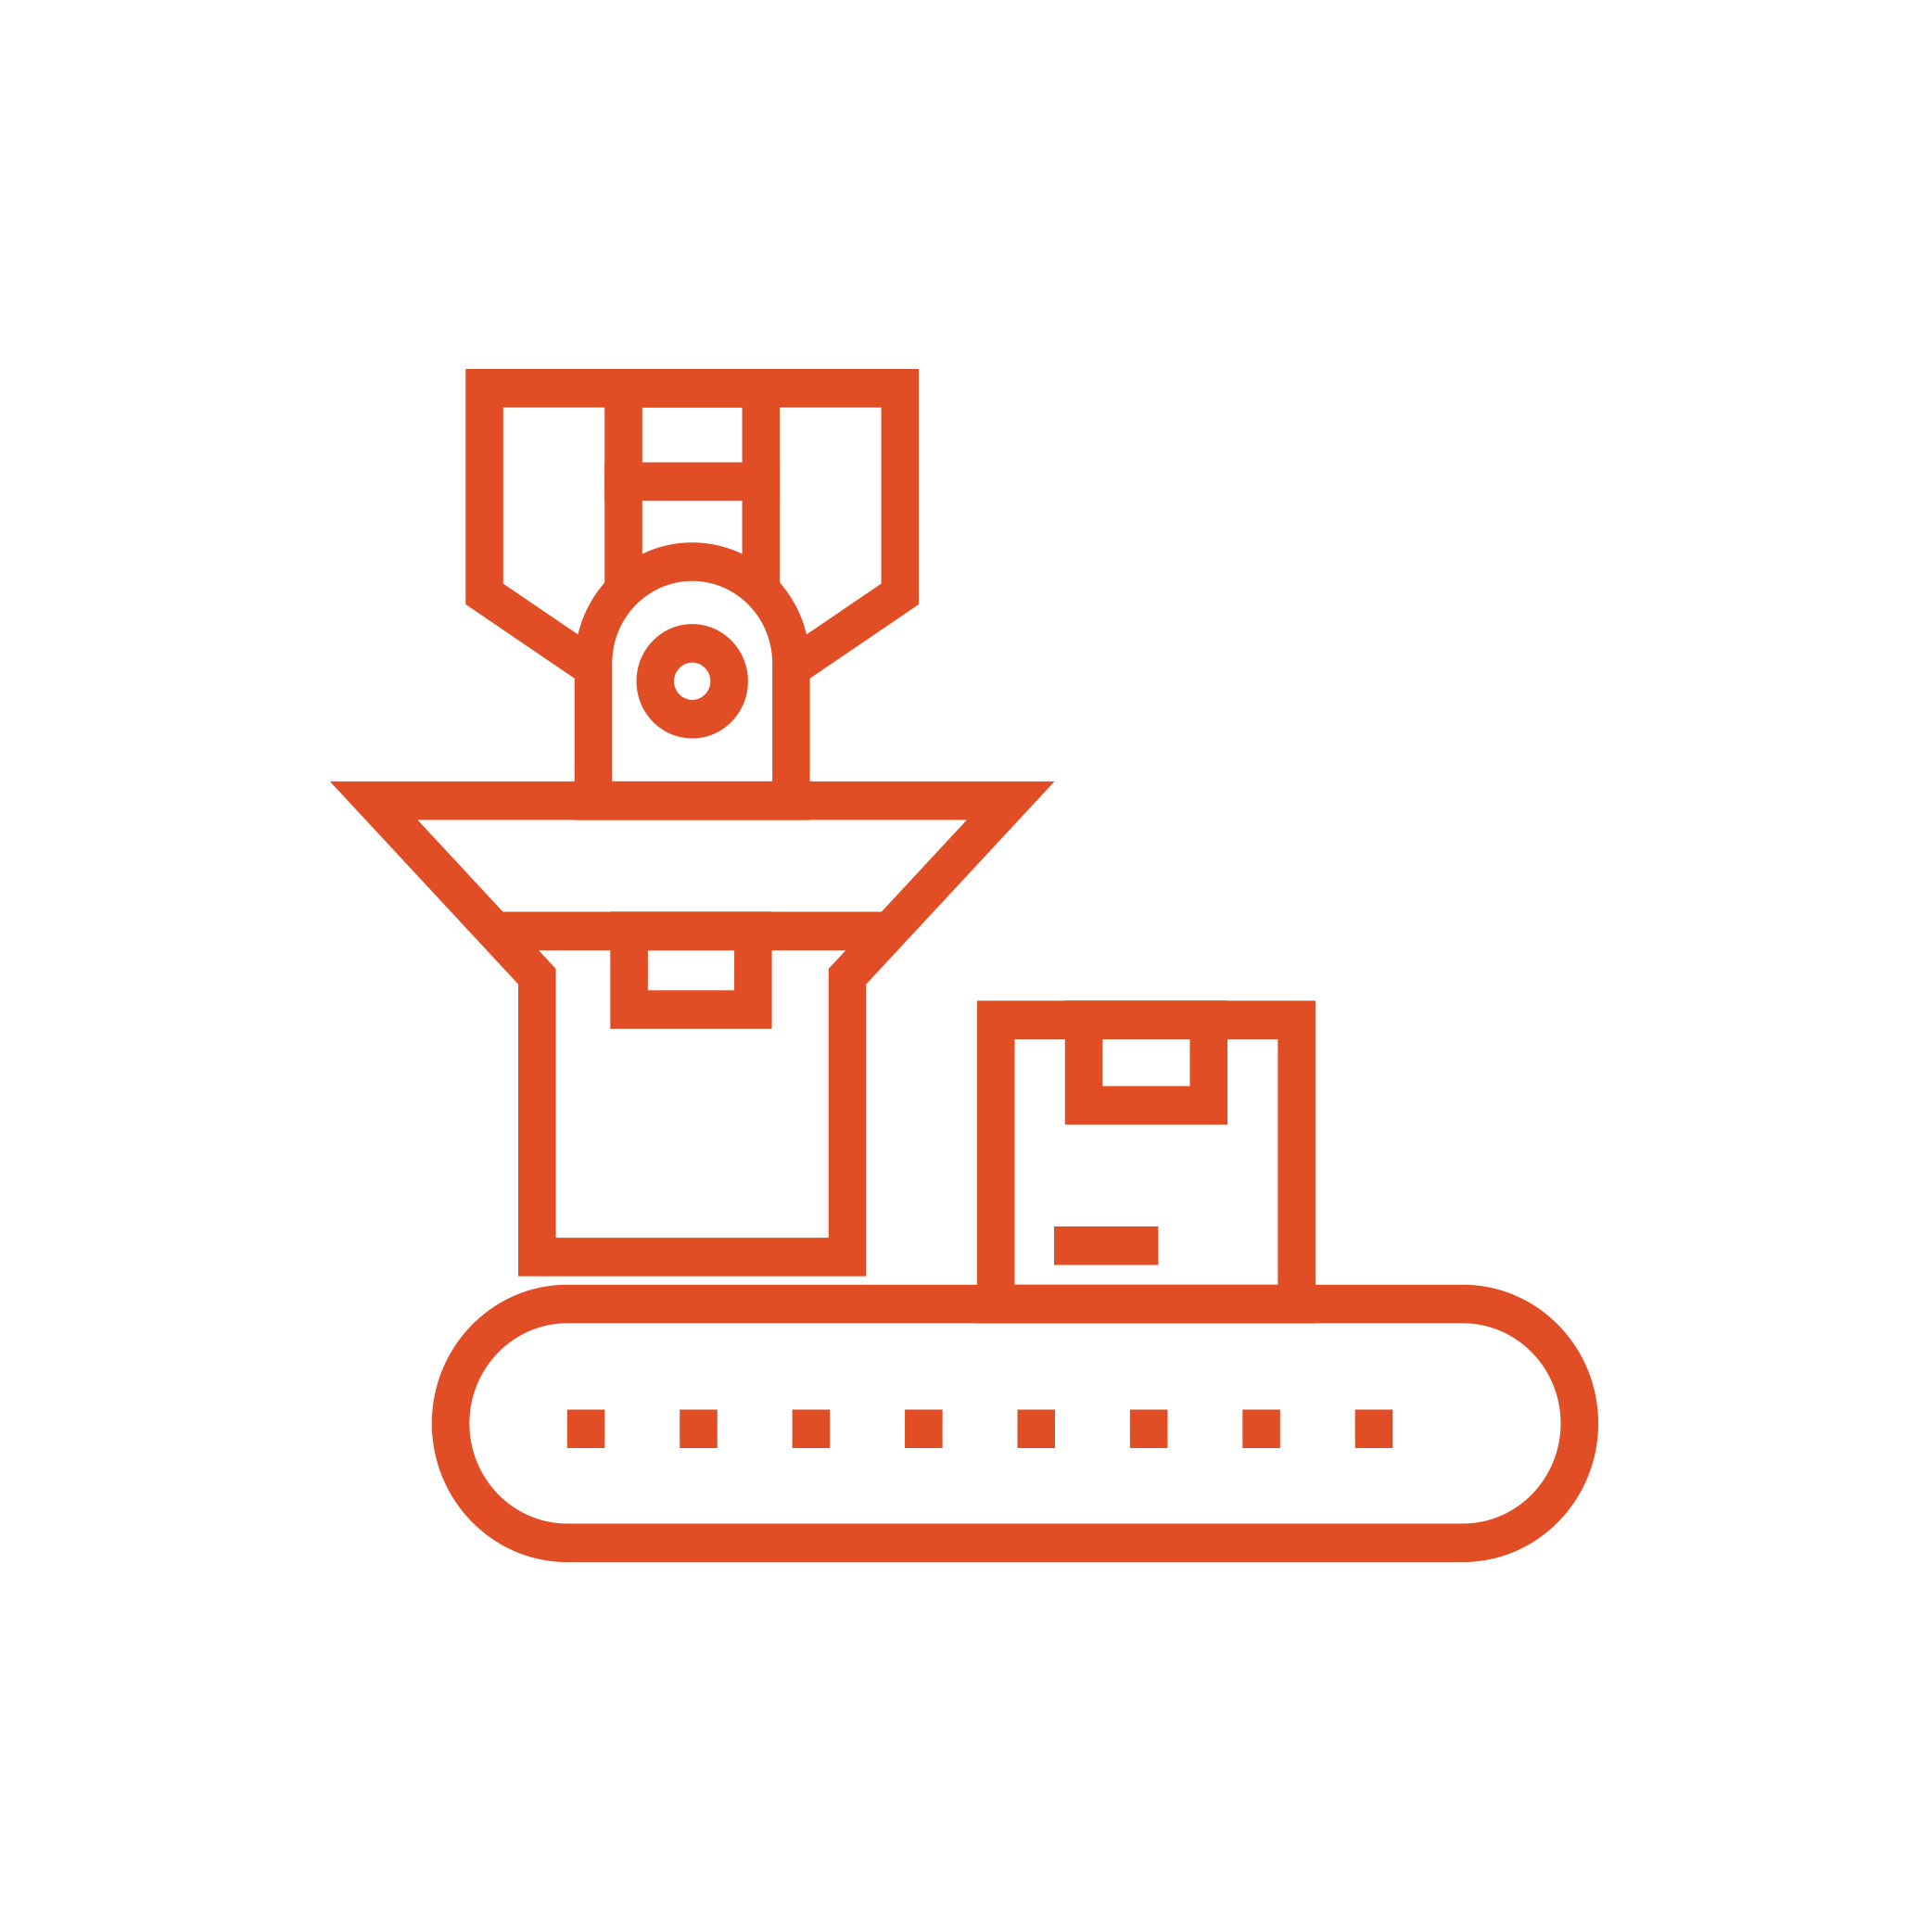 Neon-Line_Warehouse